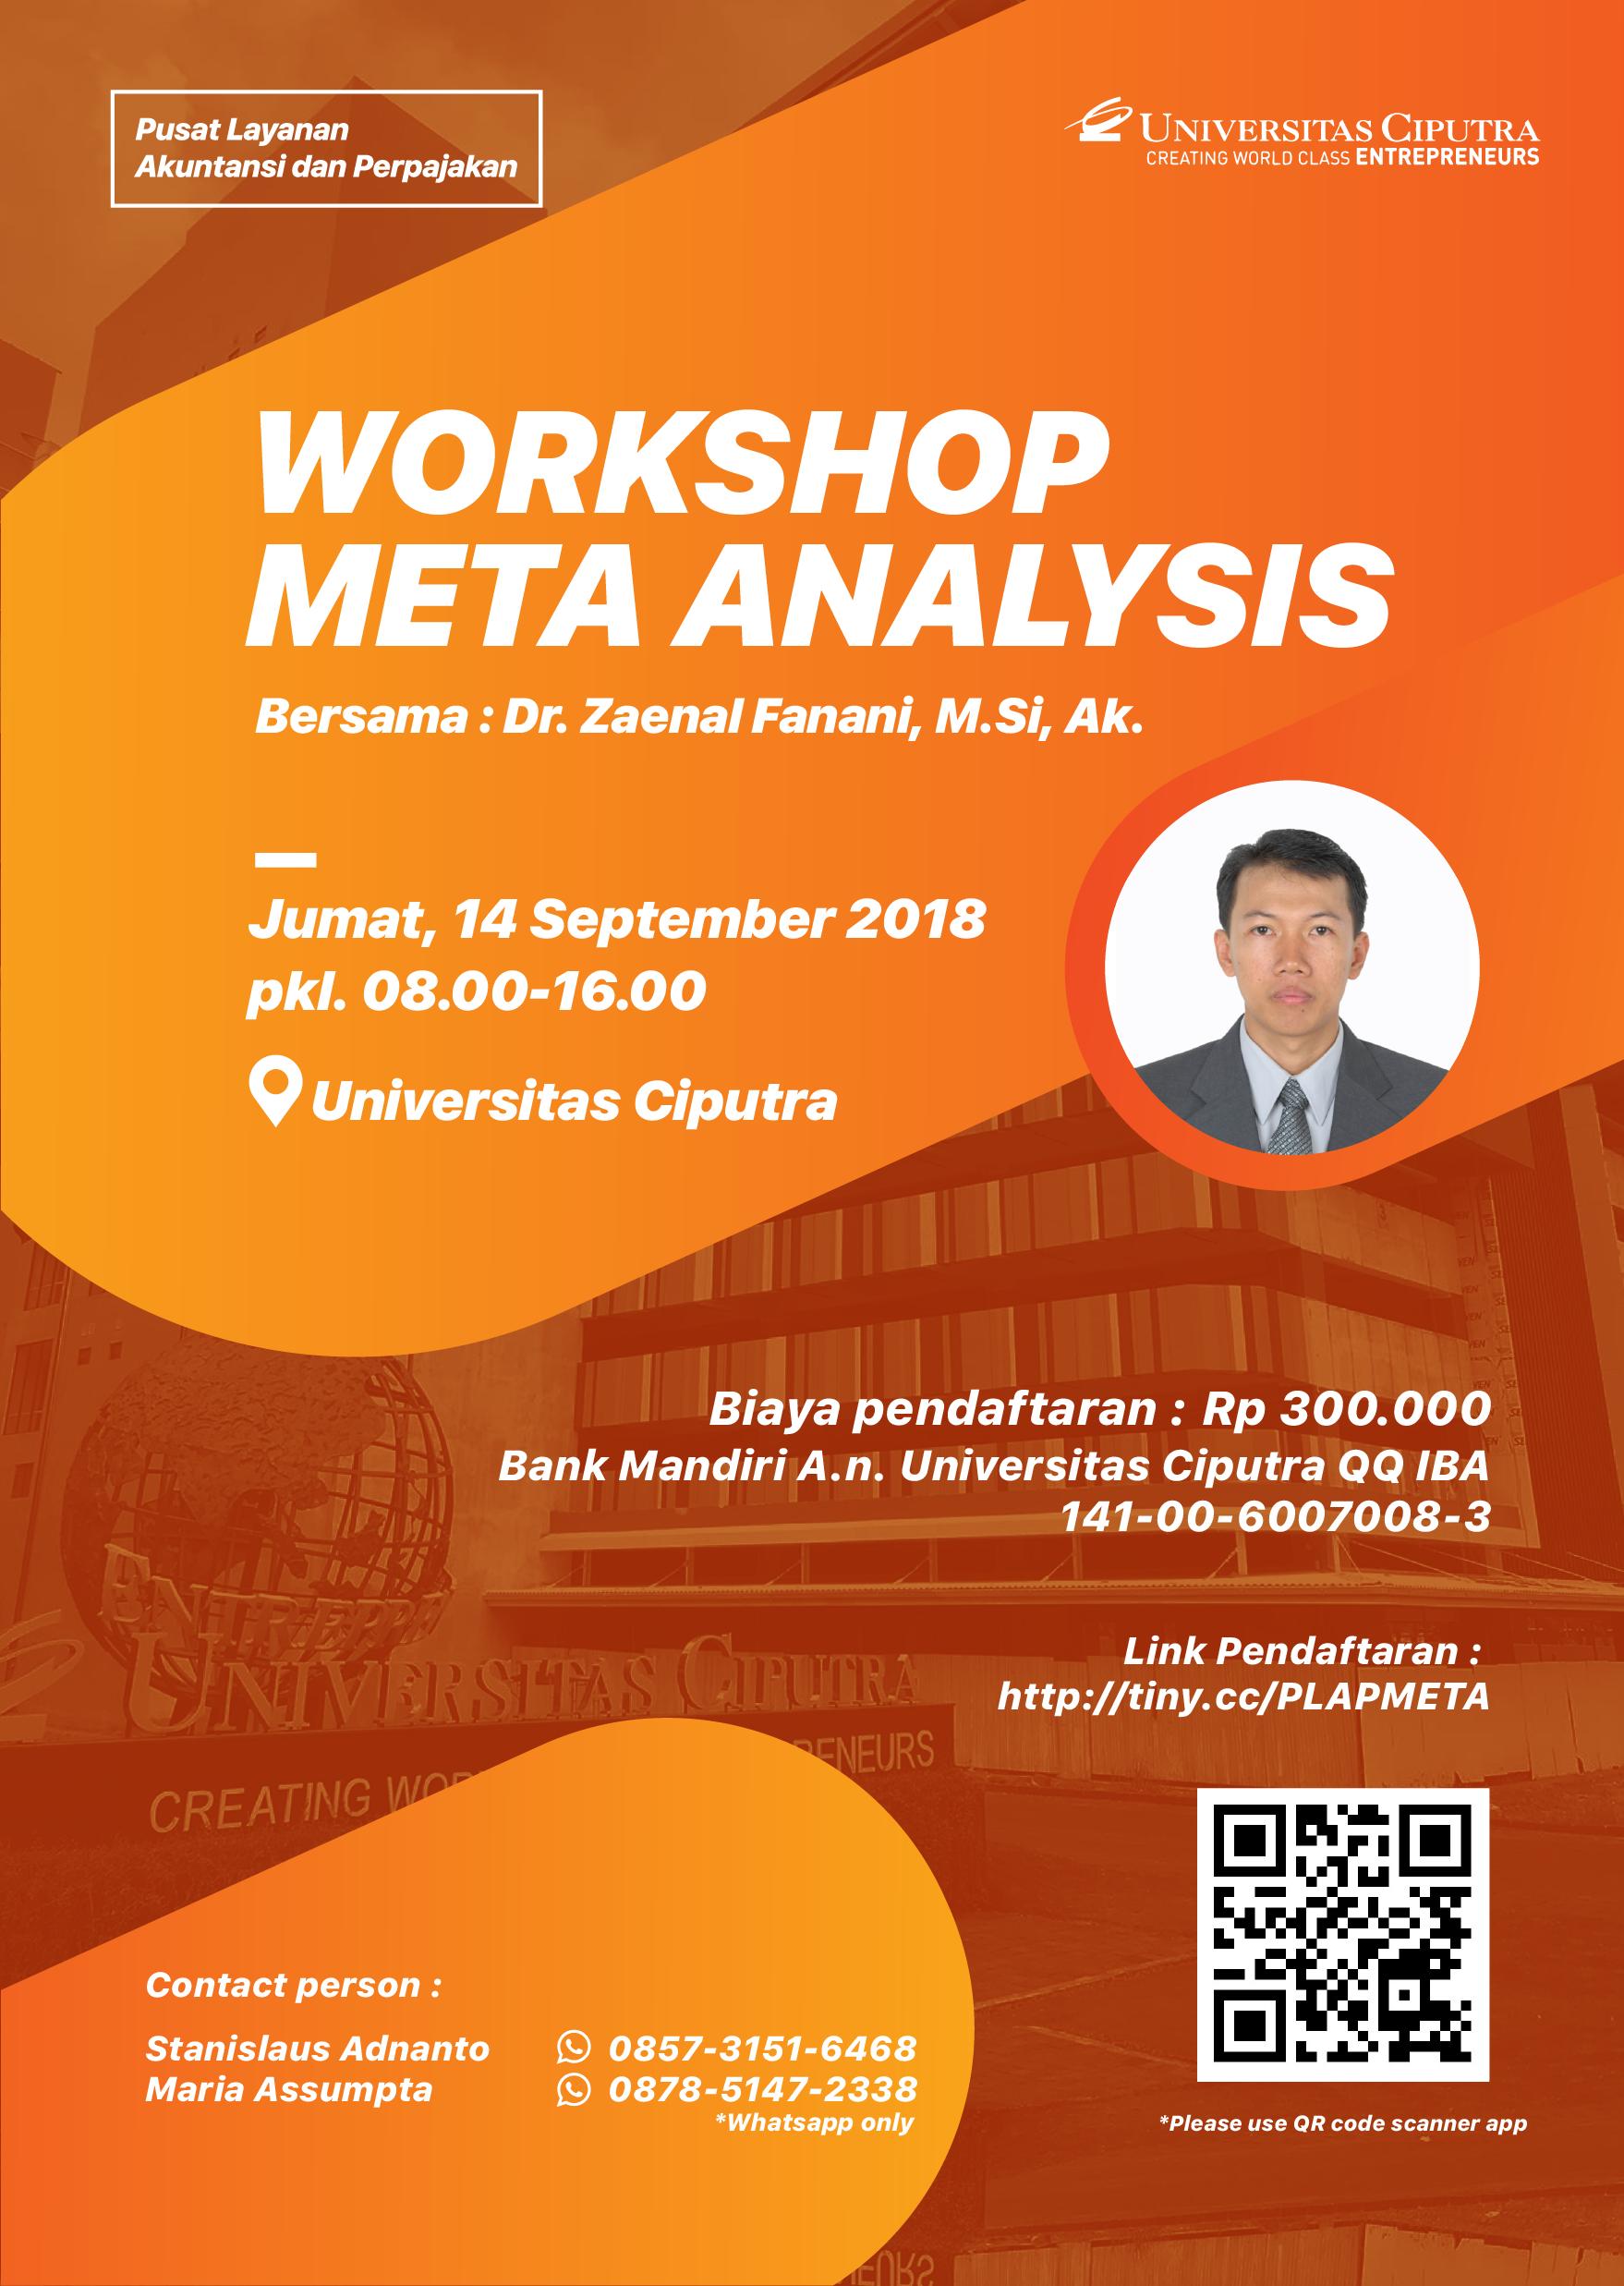 """Workshop Meta Analysis"" Speaker : Dr. Zaenal Fanani, M.Si, Ak."